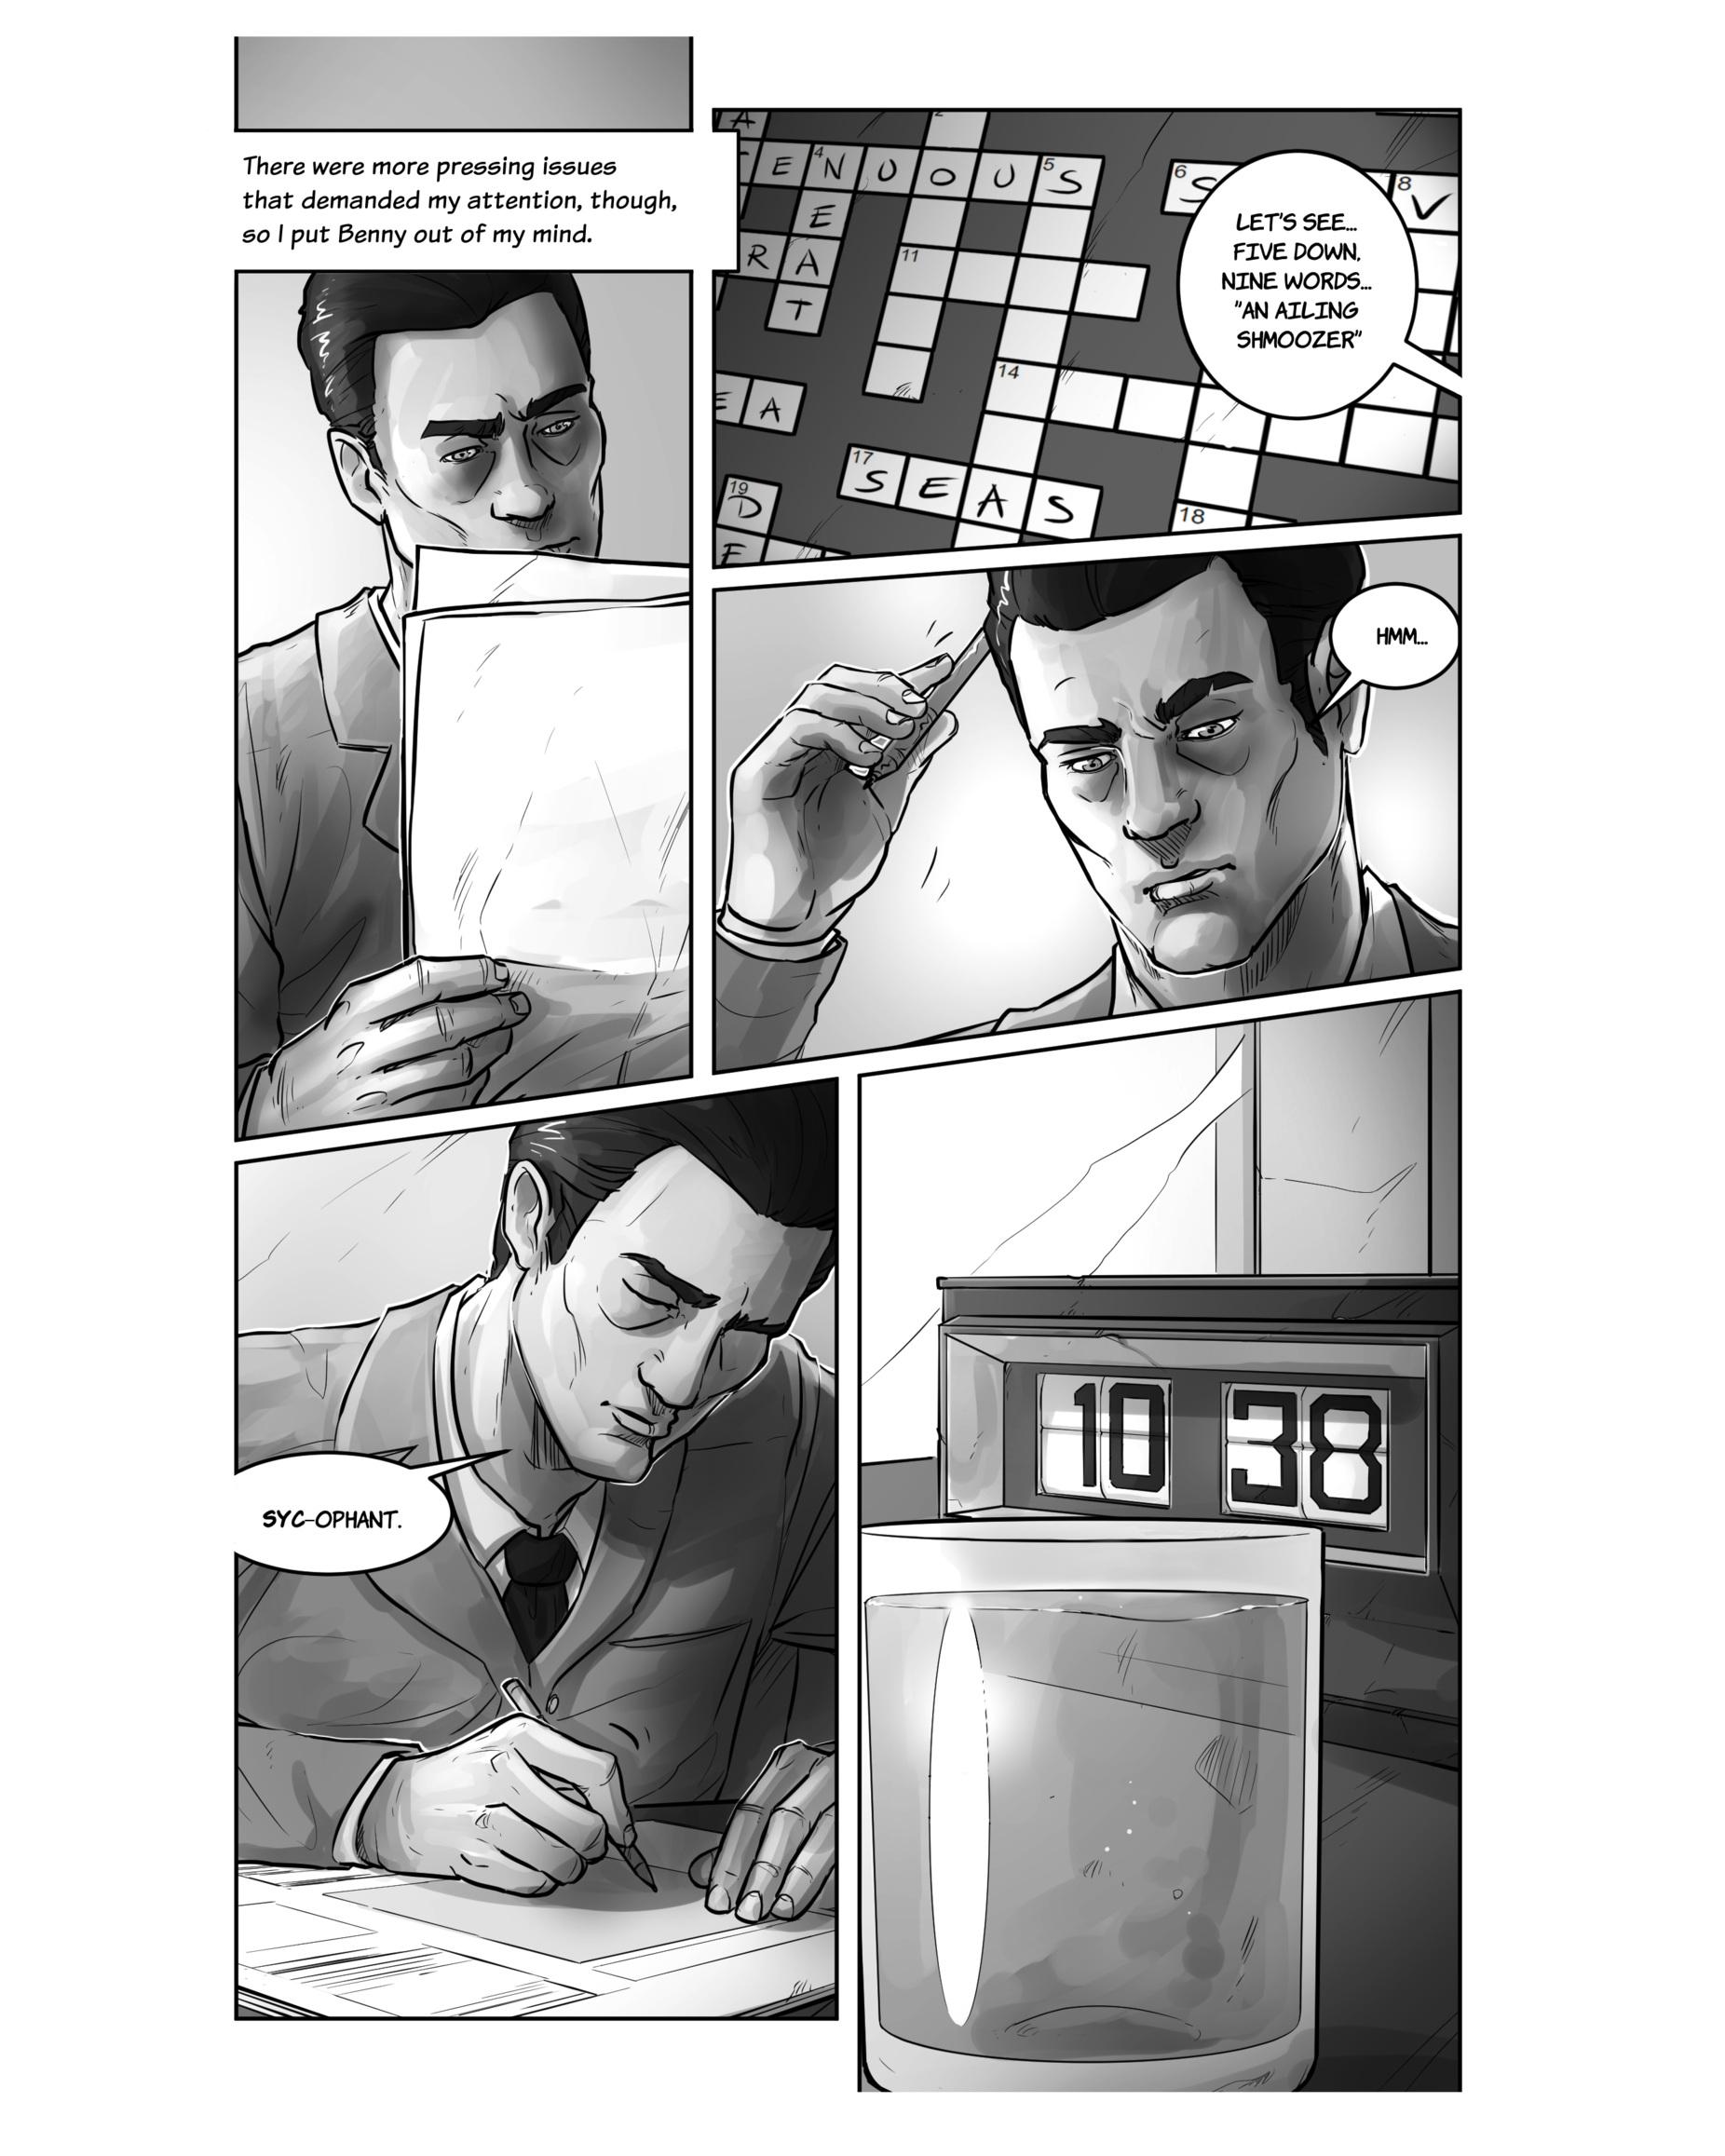 owatw_1+PAGE+19+WEB.jpg